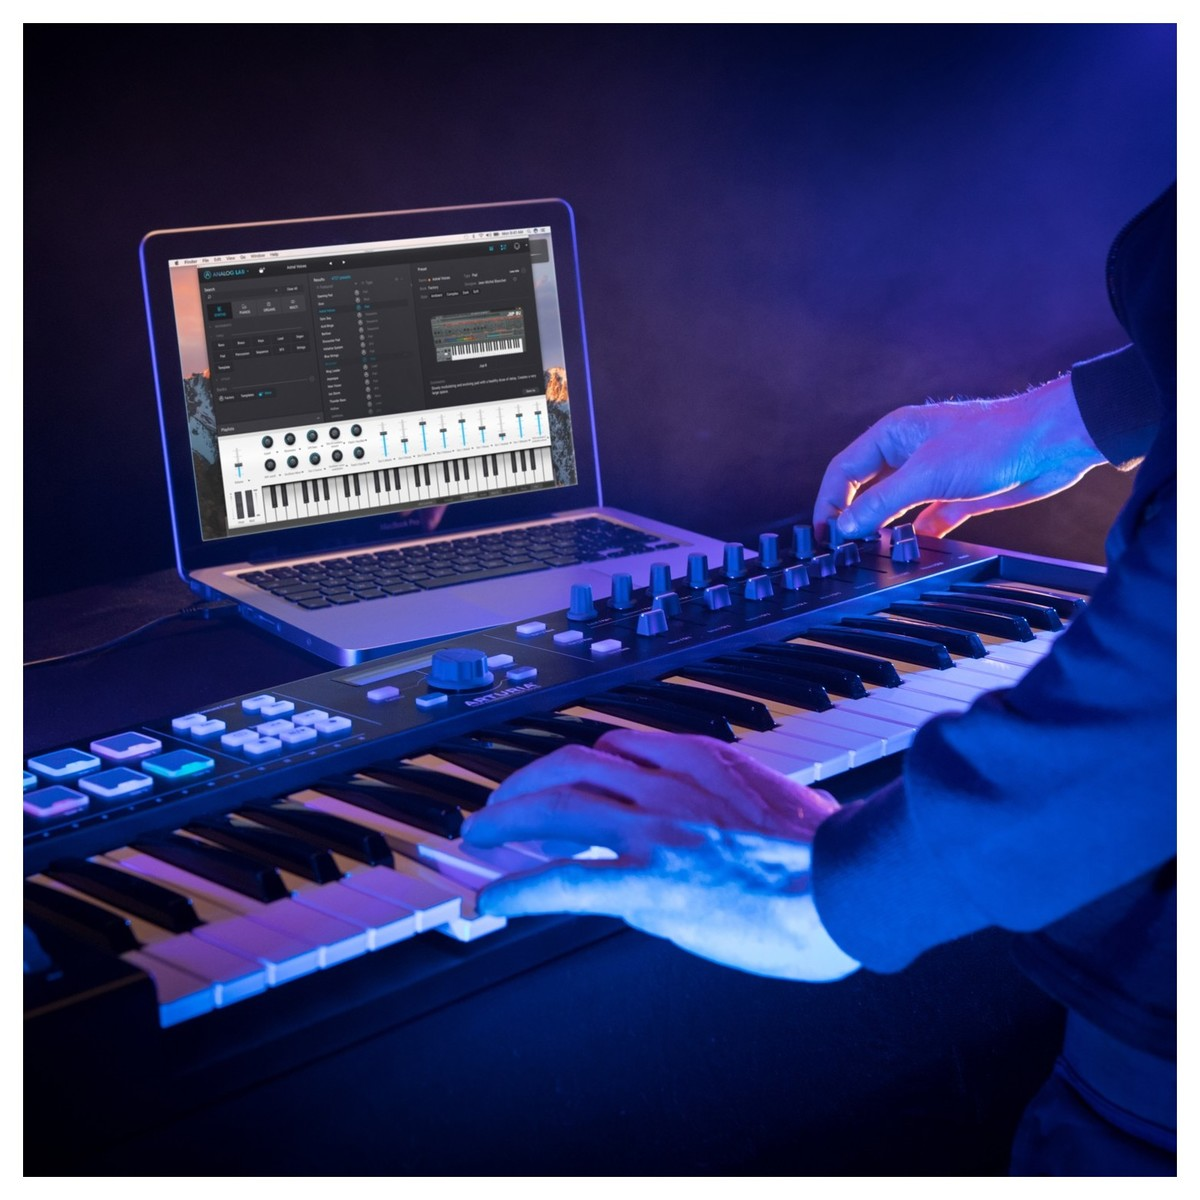 arturia keylab essential 49 midi keyboard black at gear4music. Black Bedroom Furniture Sets. Home Design Ideas